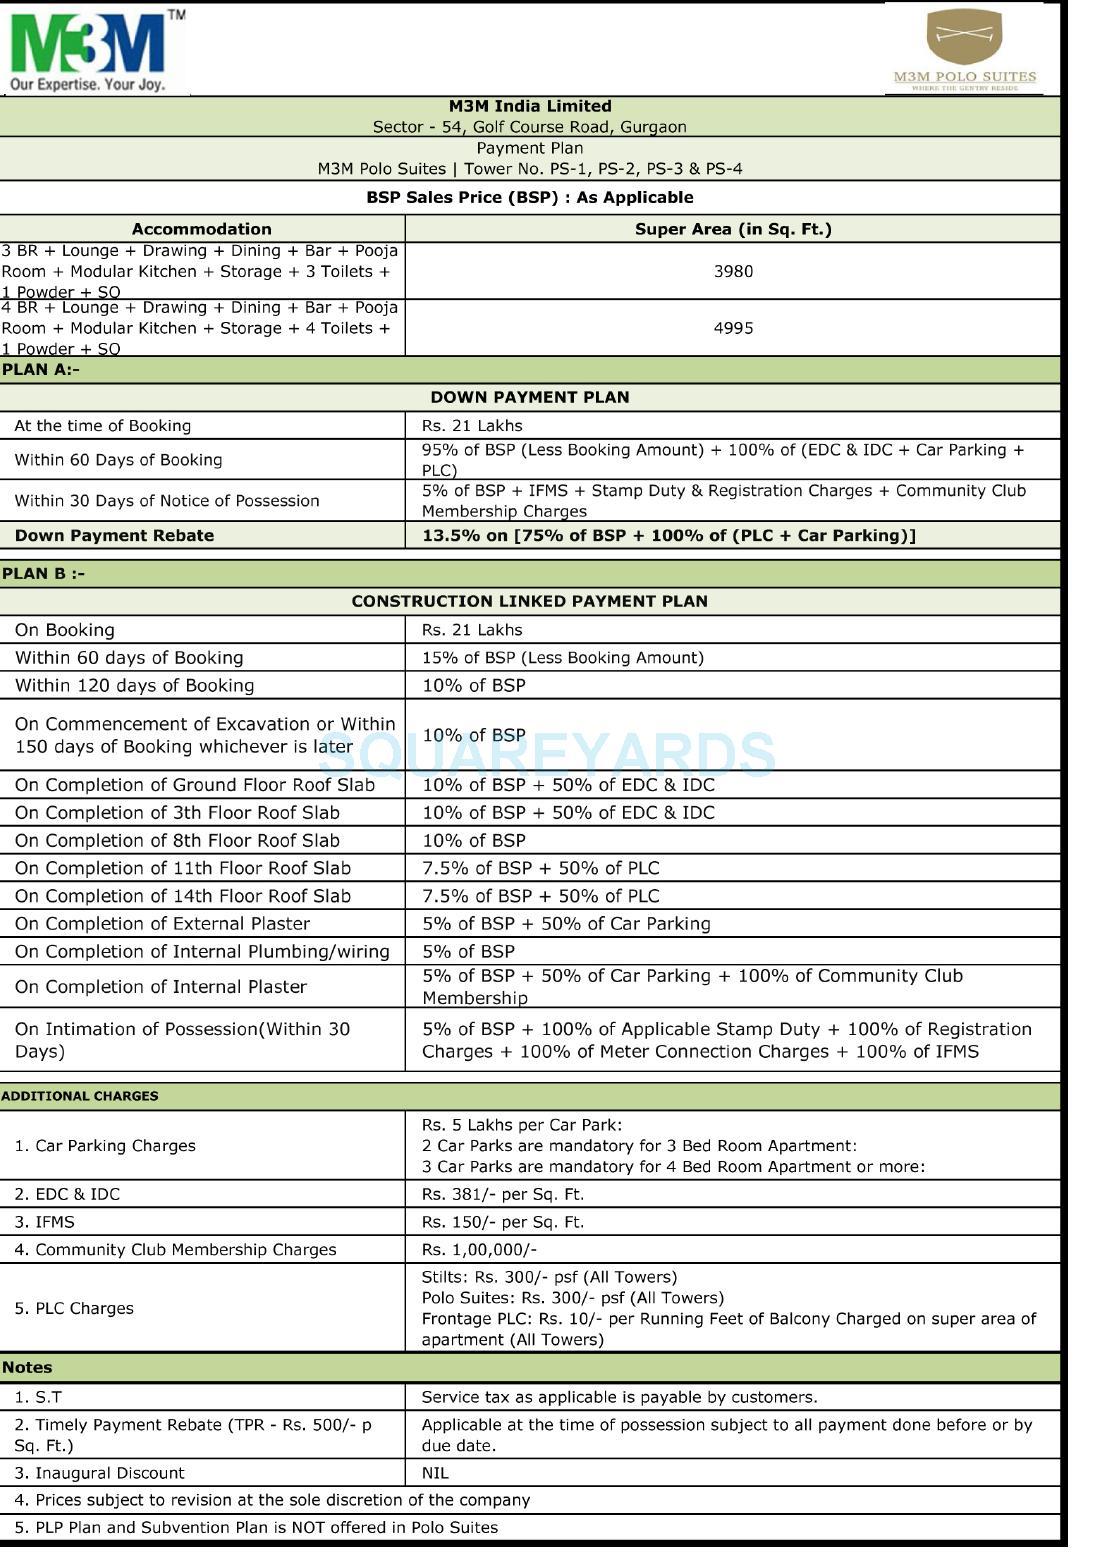 m3m polo suites payment plan image2